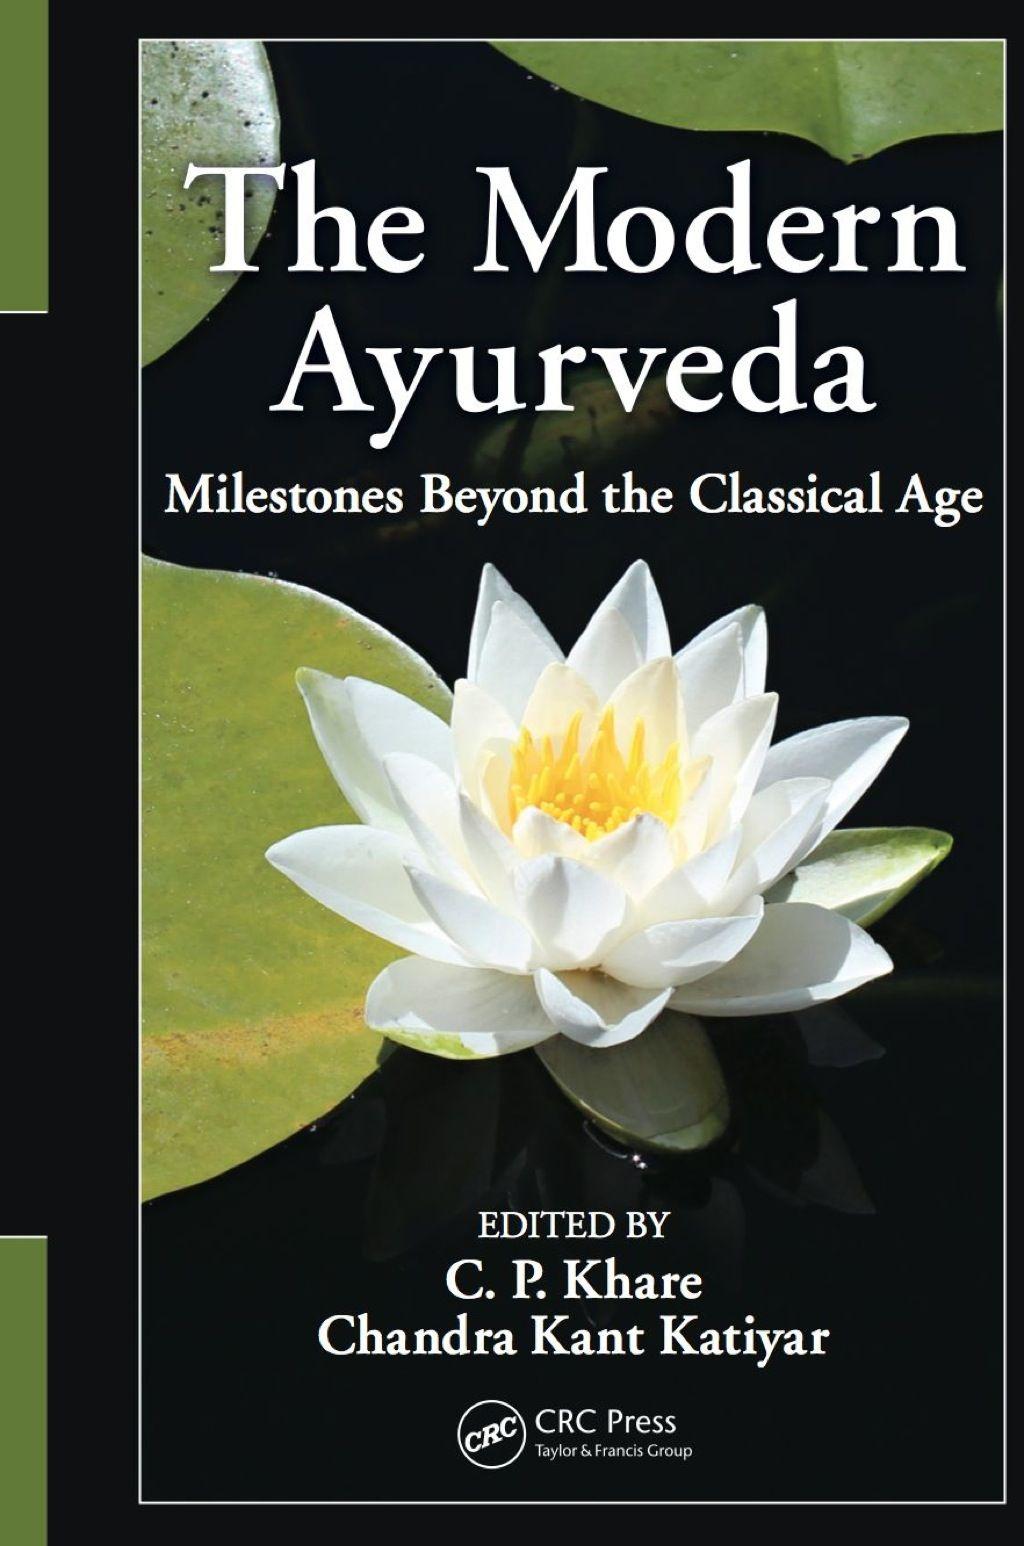 The Modern Ayurveda (eBook Rental) | Products | Ayurveda, Modern, Books